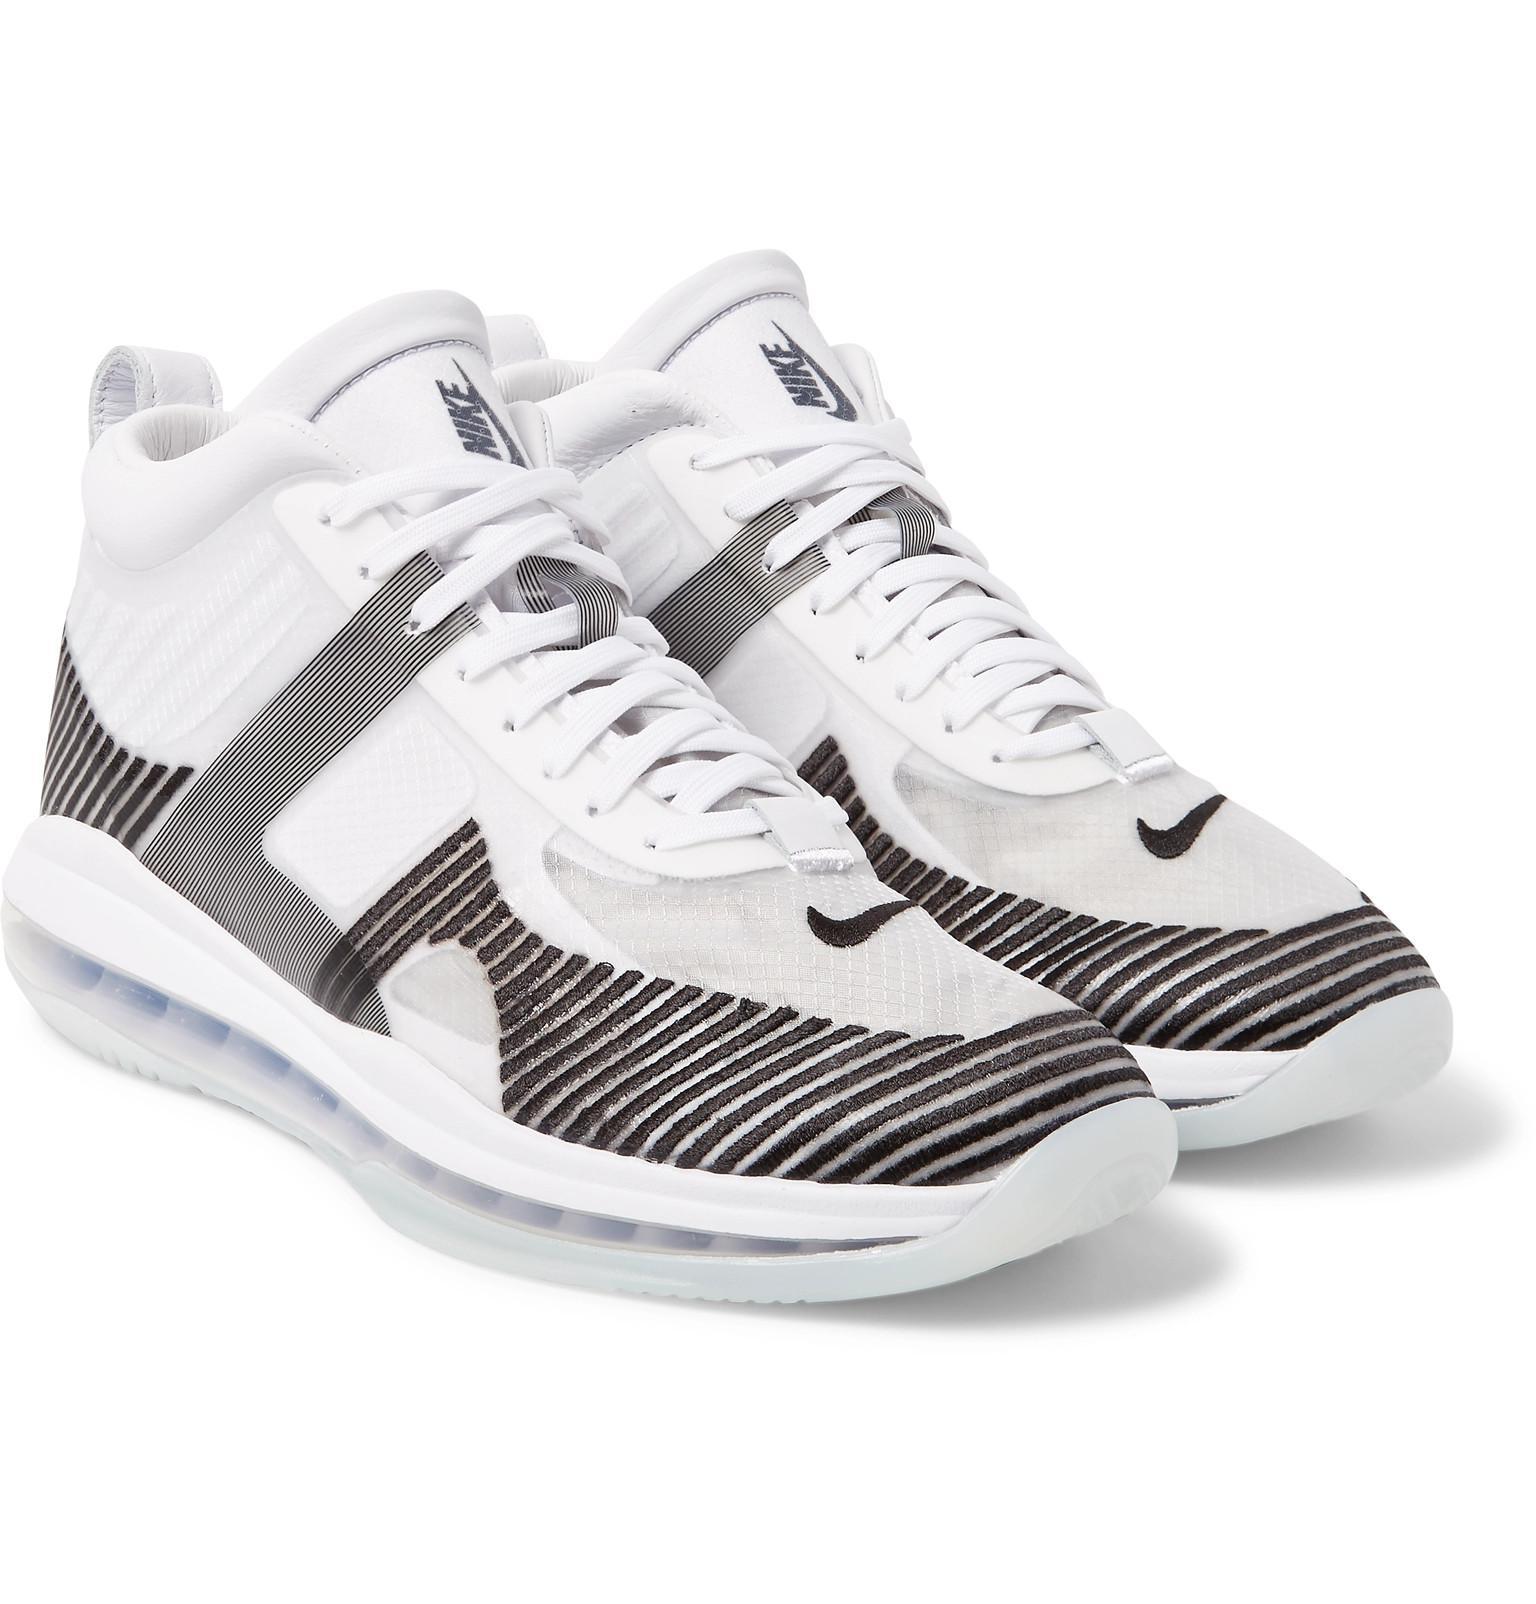 024a07d7f30 Nike + Lebron James X John Elliott Icon Qs High-top Sneakers in ...